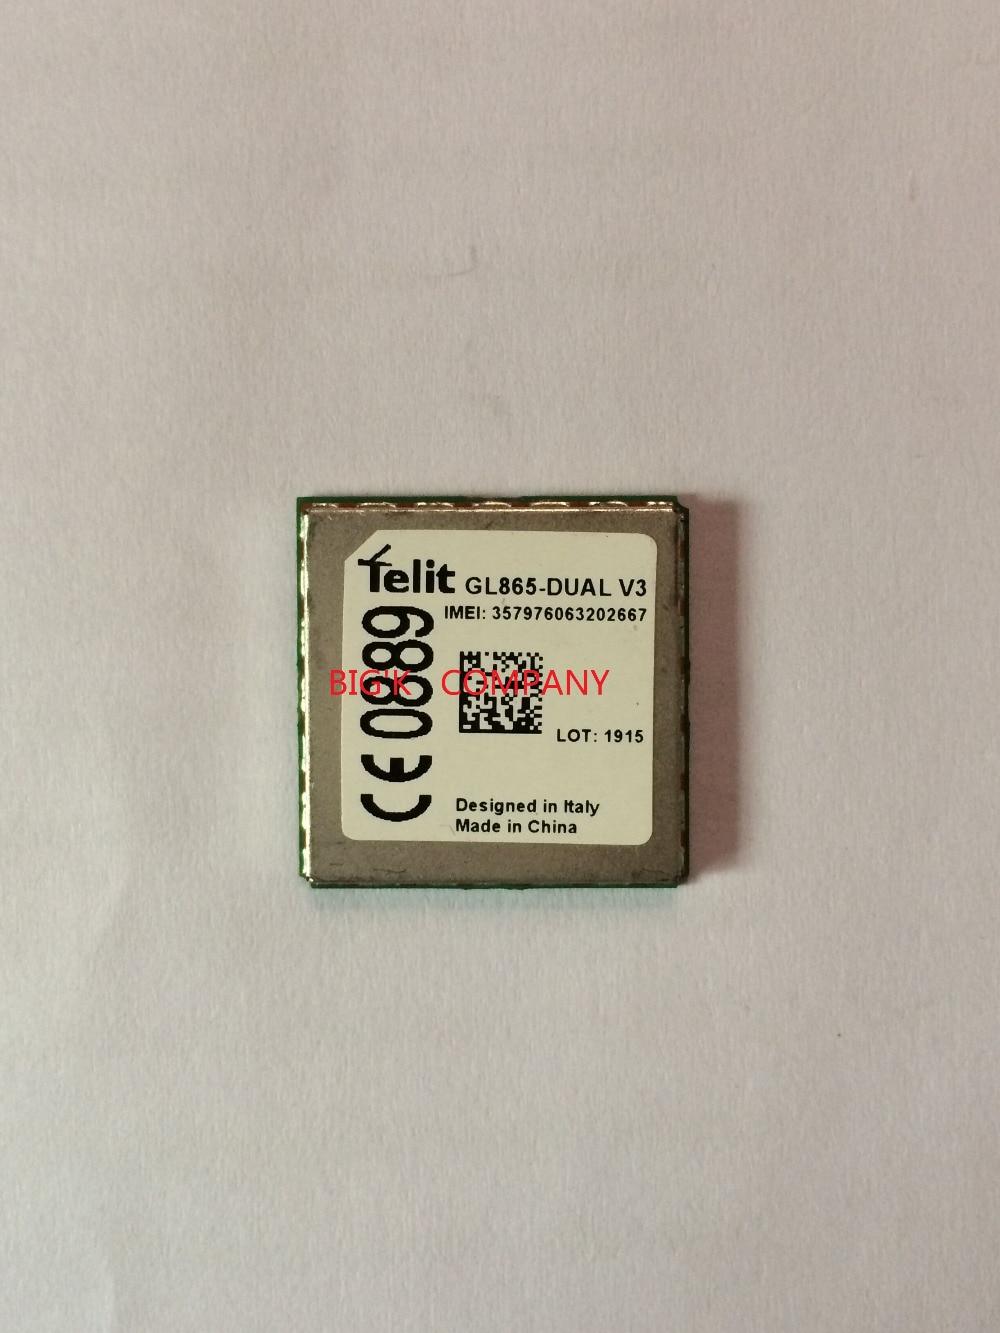 JINYUSHI PER Telit GL865-V3 GL865 2G 100% New & Original Genuine Distributore GSM/GPRS Incorporato quad-modulo fasce